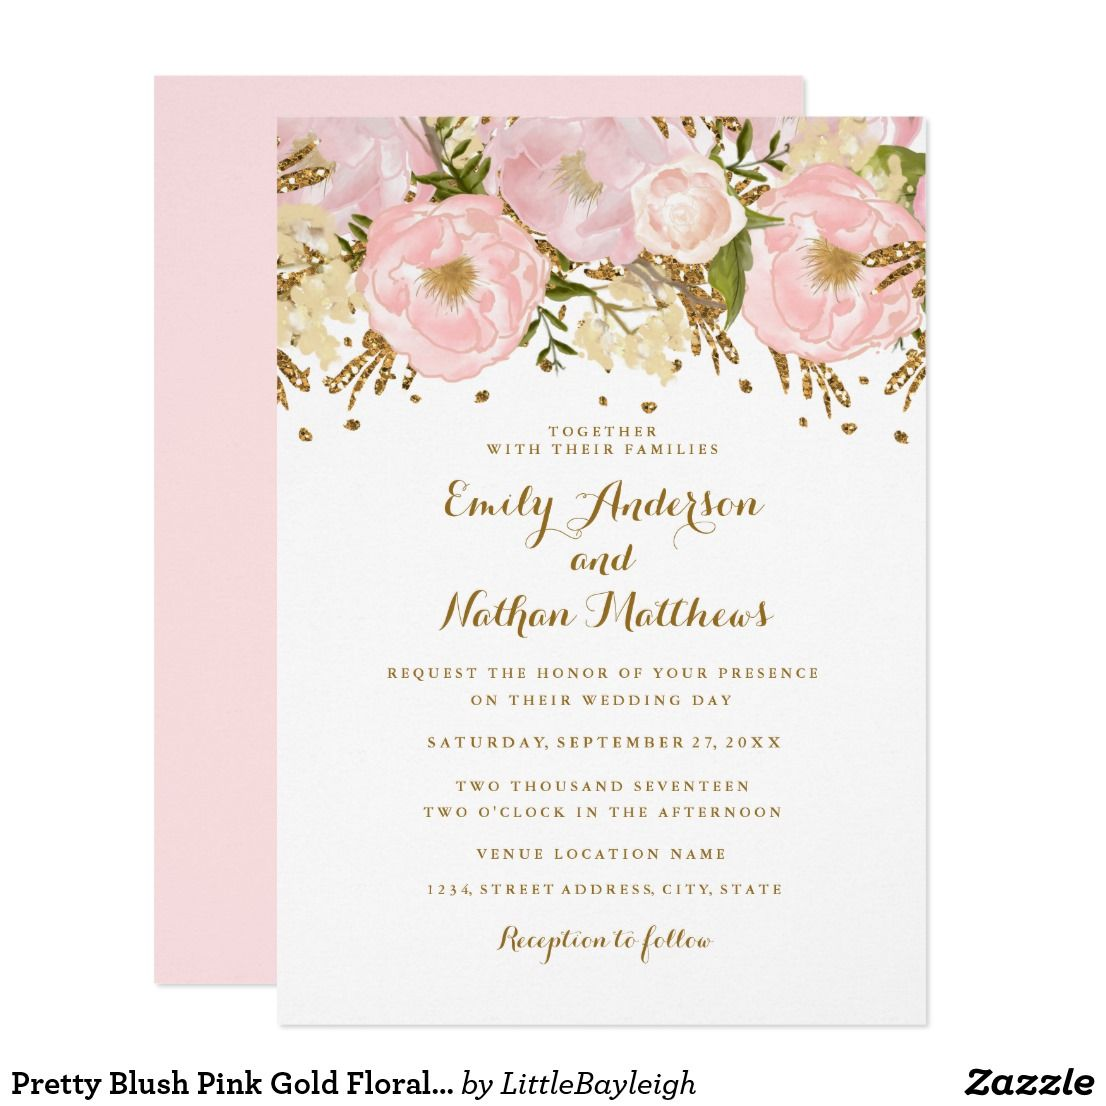 Pretty Blush Pink Gold Floral Wedding Invitation Zazzle Com Floral Baby Shower Invitations Sweet Sixteen Invitations Pink Invitations